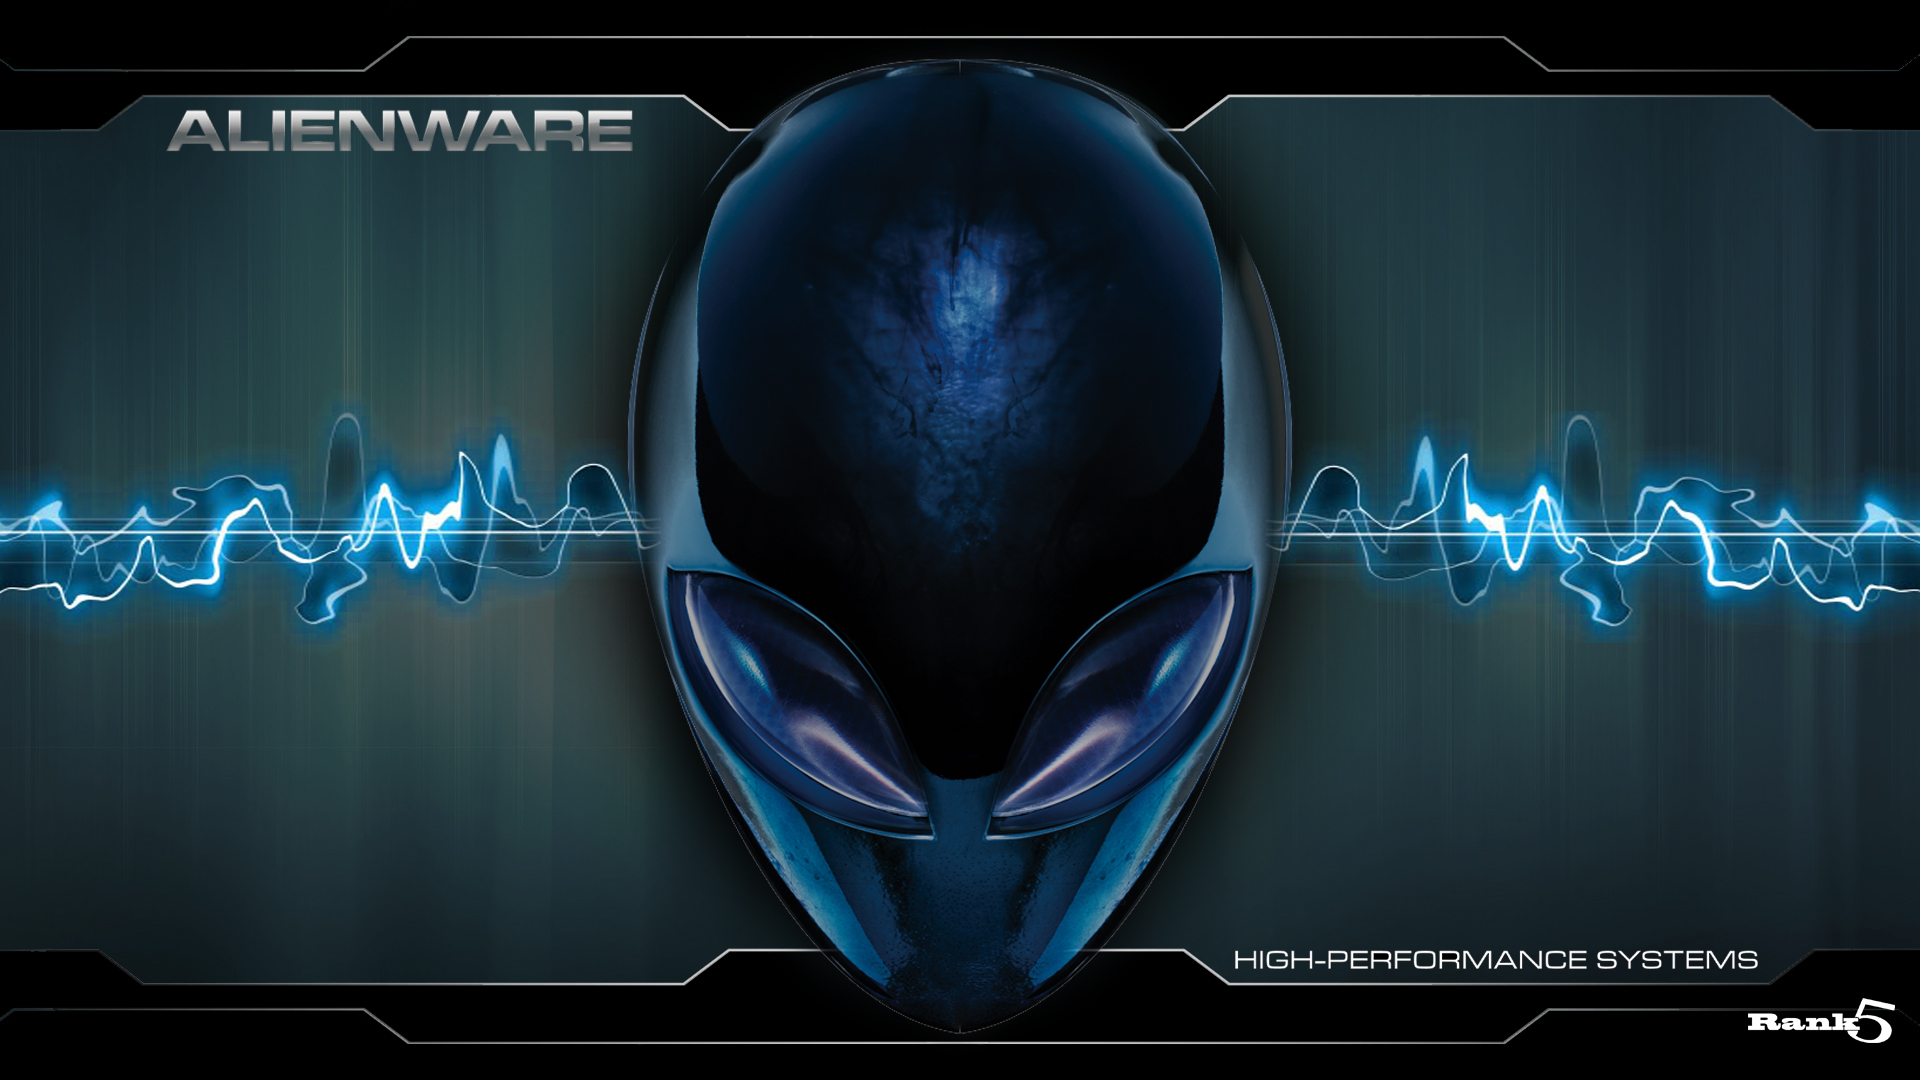 HD Alienware Wallpapers 19201080 Alienware Backgrounds for Laptops 1920x1080